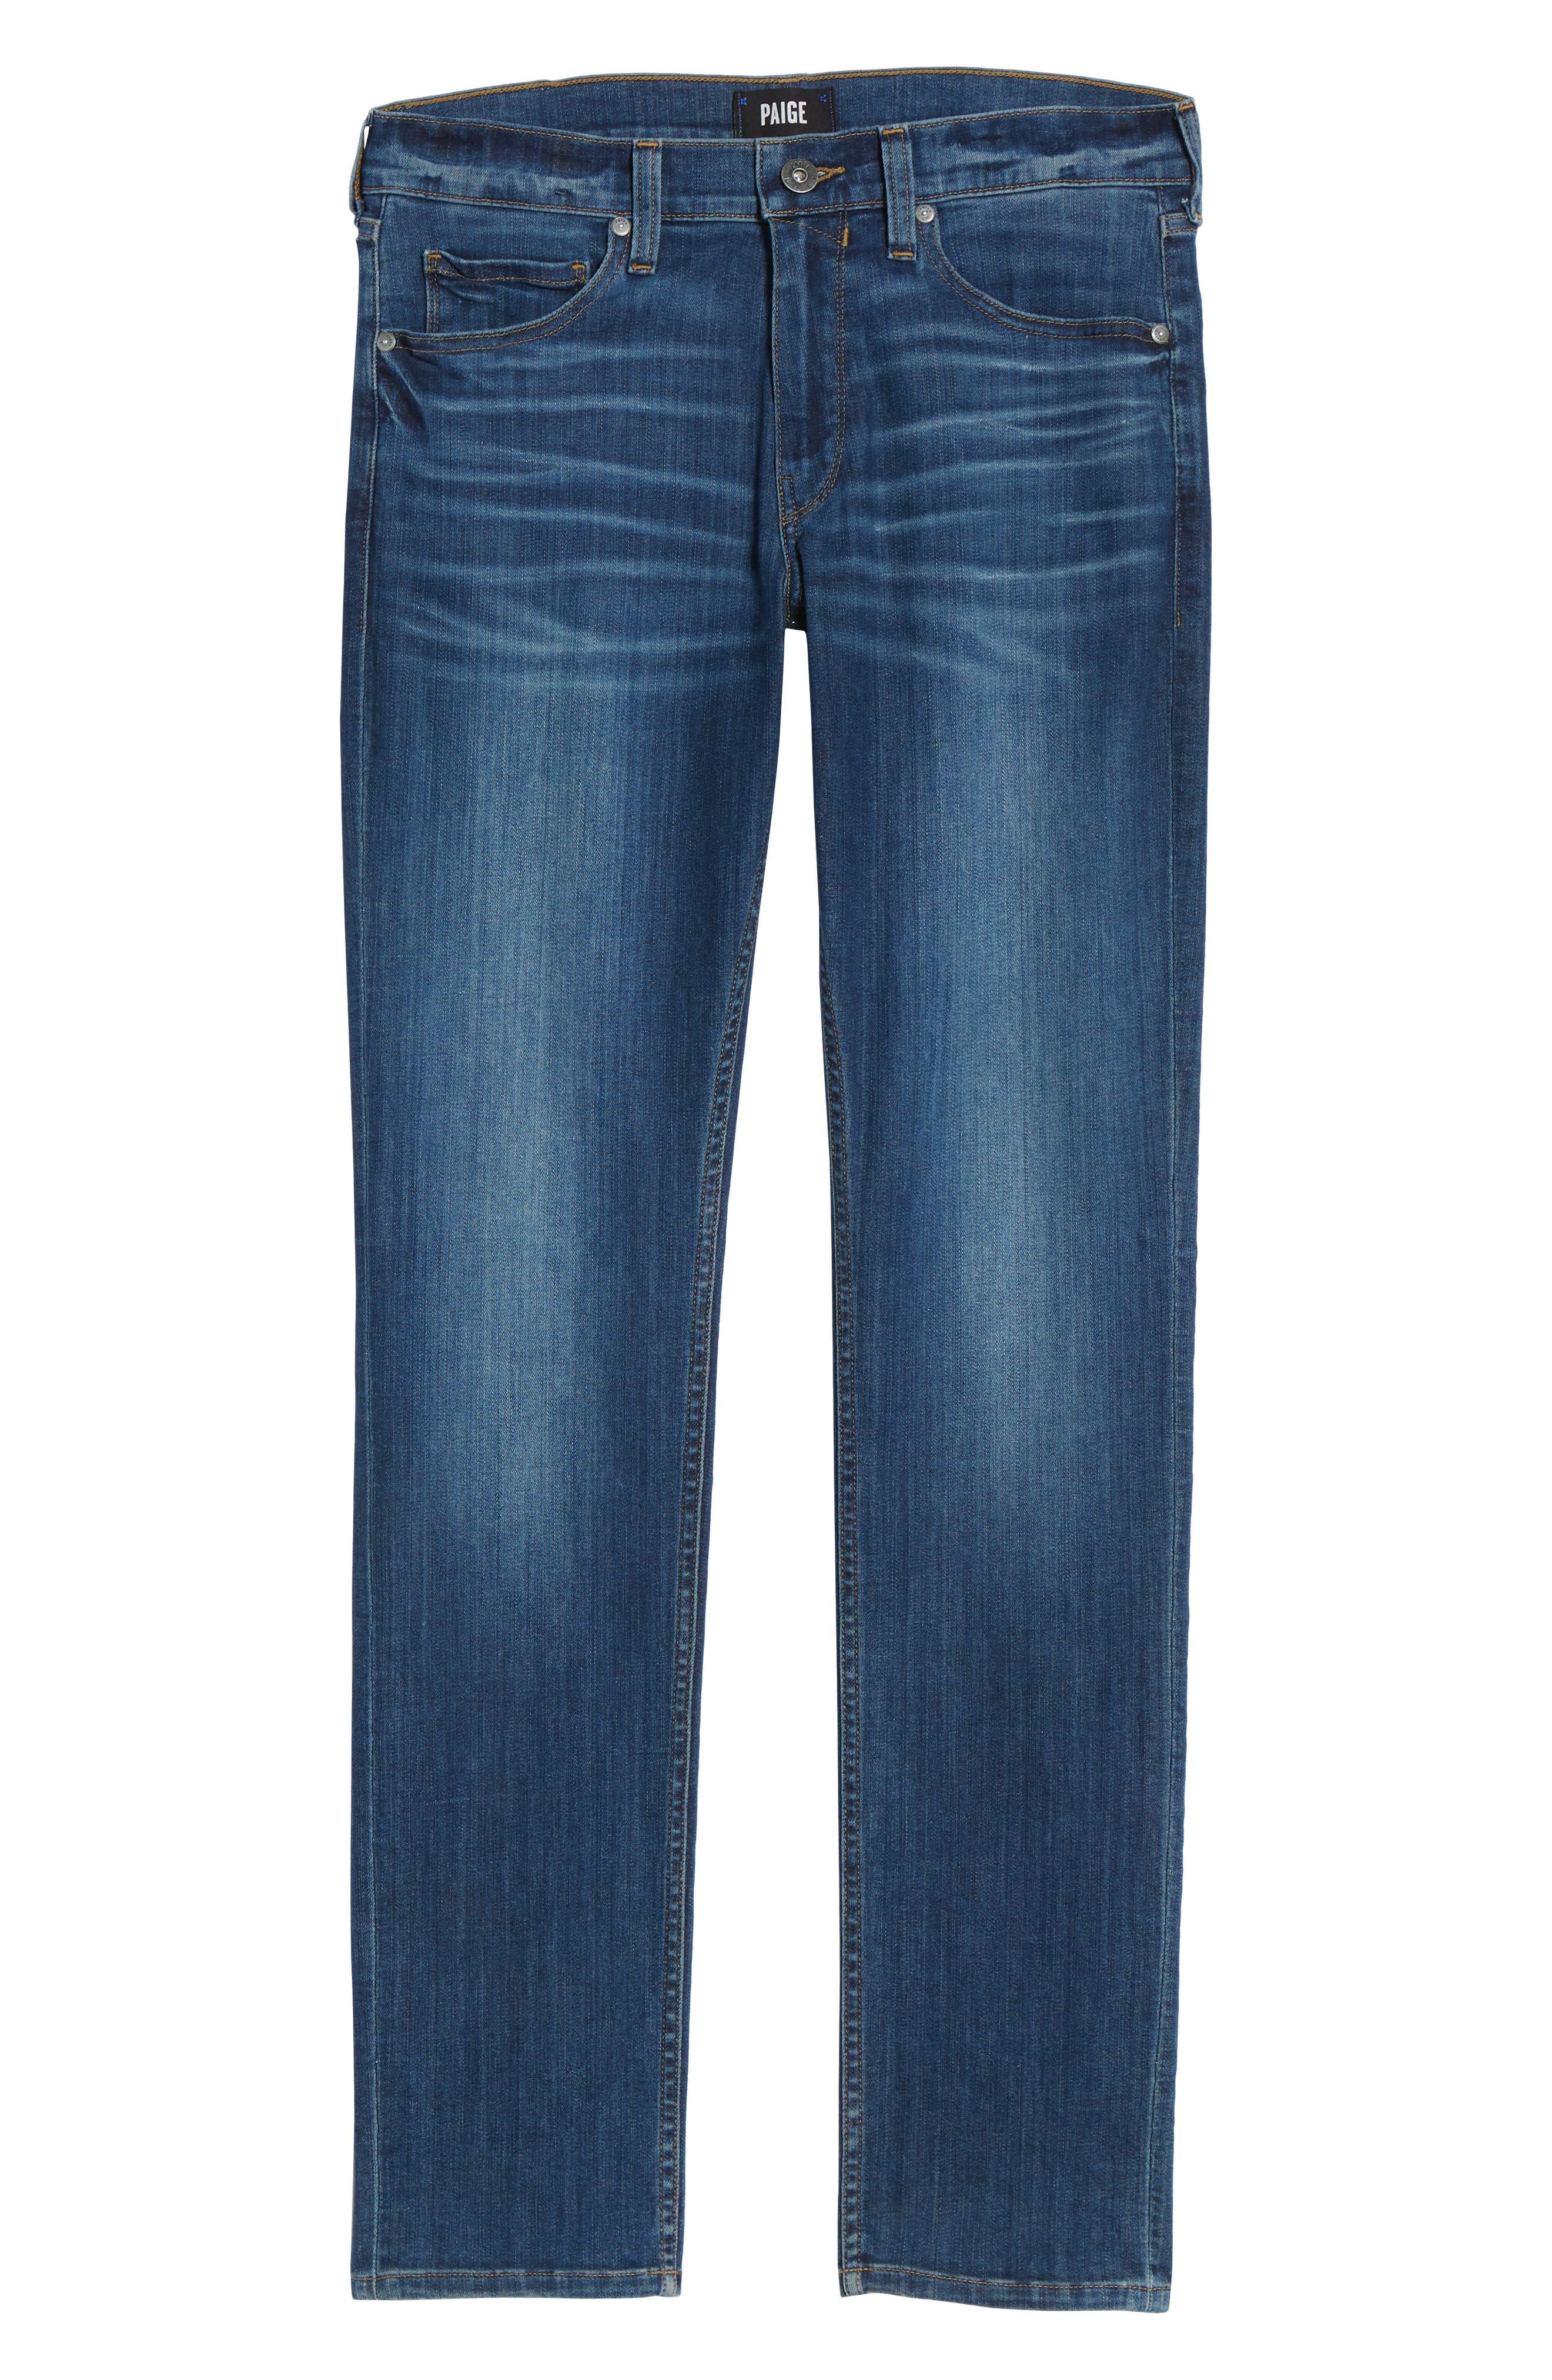 Transcend - Lennox Slim Fit Jeans,                             Alternate thumbnail 6, color,                             400